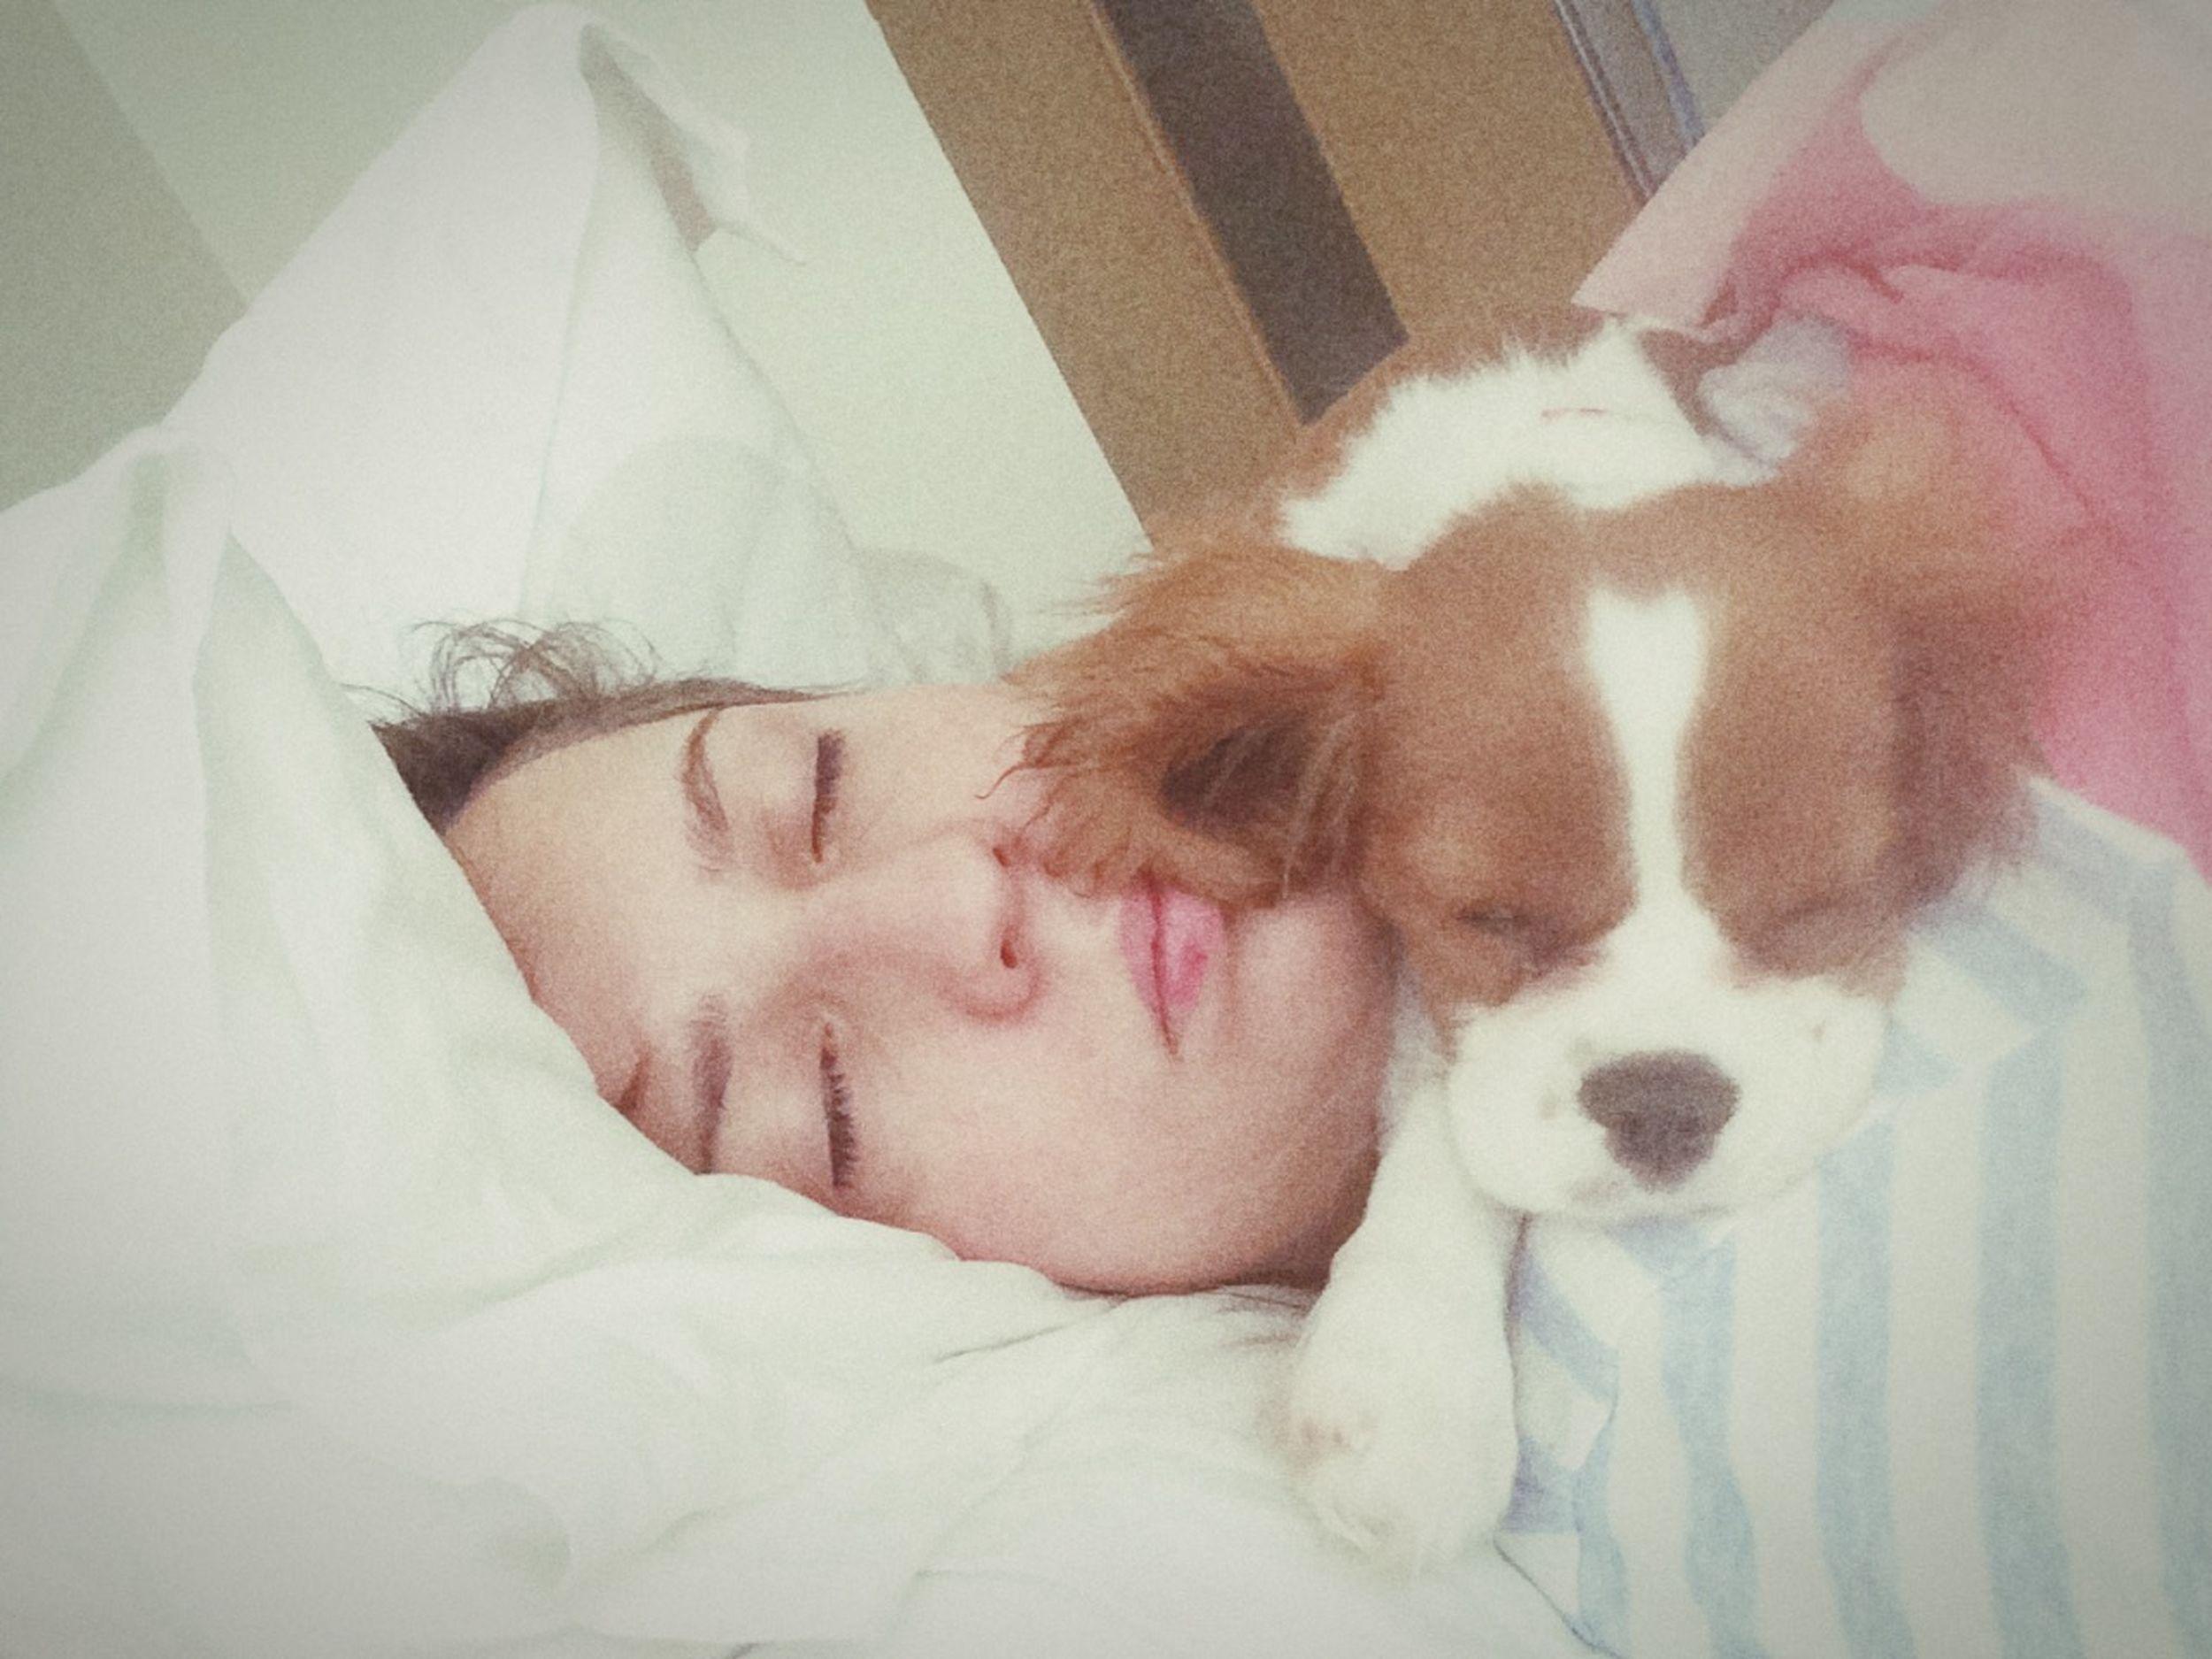 Sleepin With My Dog Dog Cute Cute Pets Cavalier King Charles Spaniel I Love My Dog that's the way we sleep.. Aha aha, we like it Relaxing